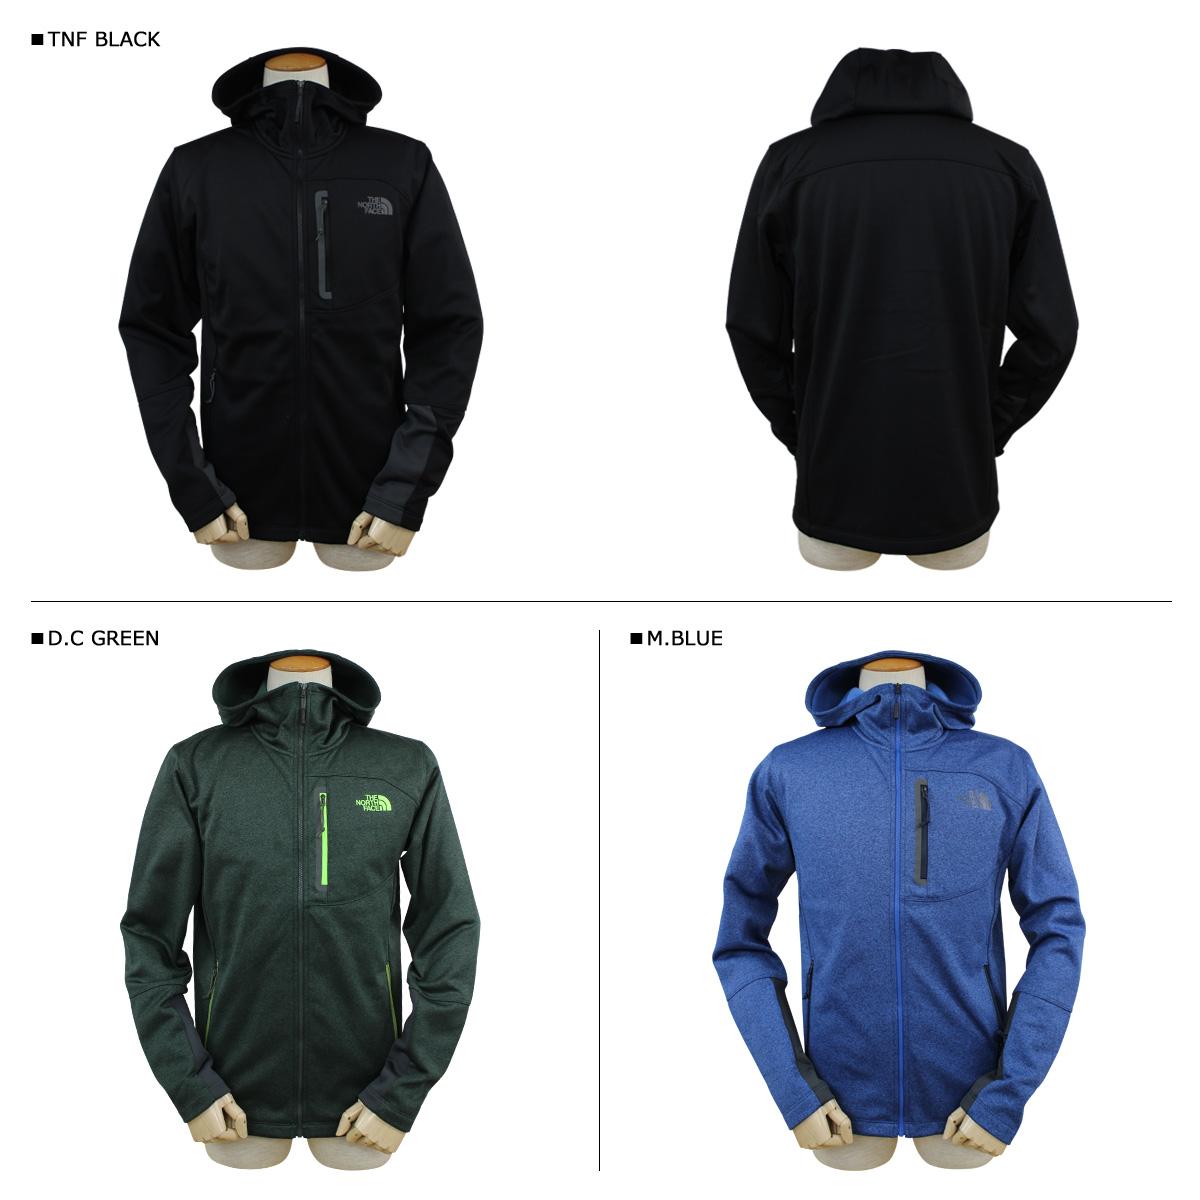 0668fe668 MEN'S CANYONLANDS HOODIE men's fleece jacket, North face THE NORTH FACE